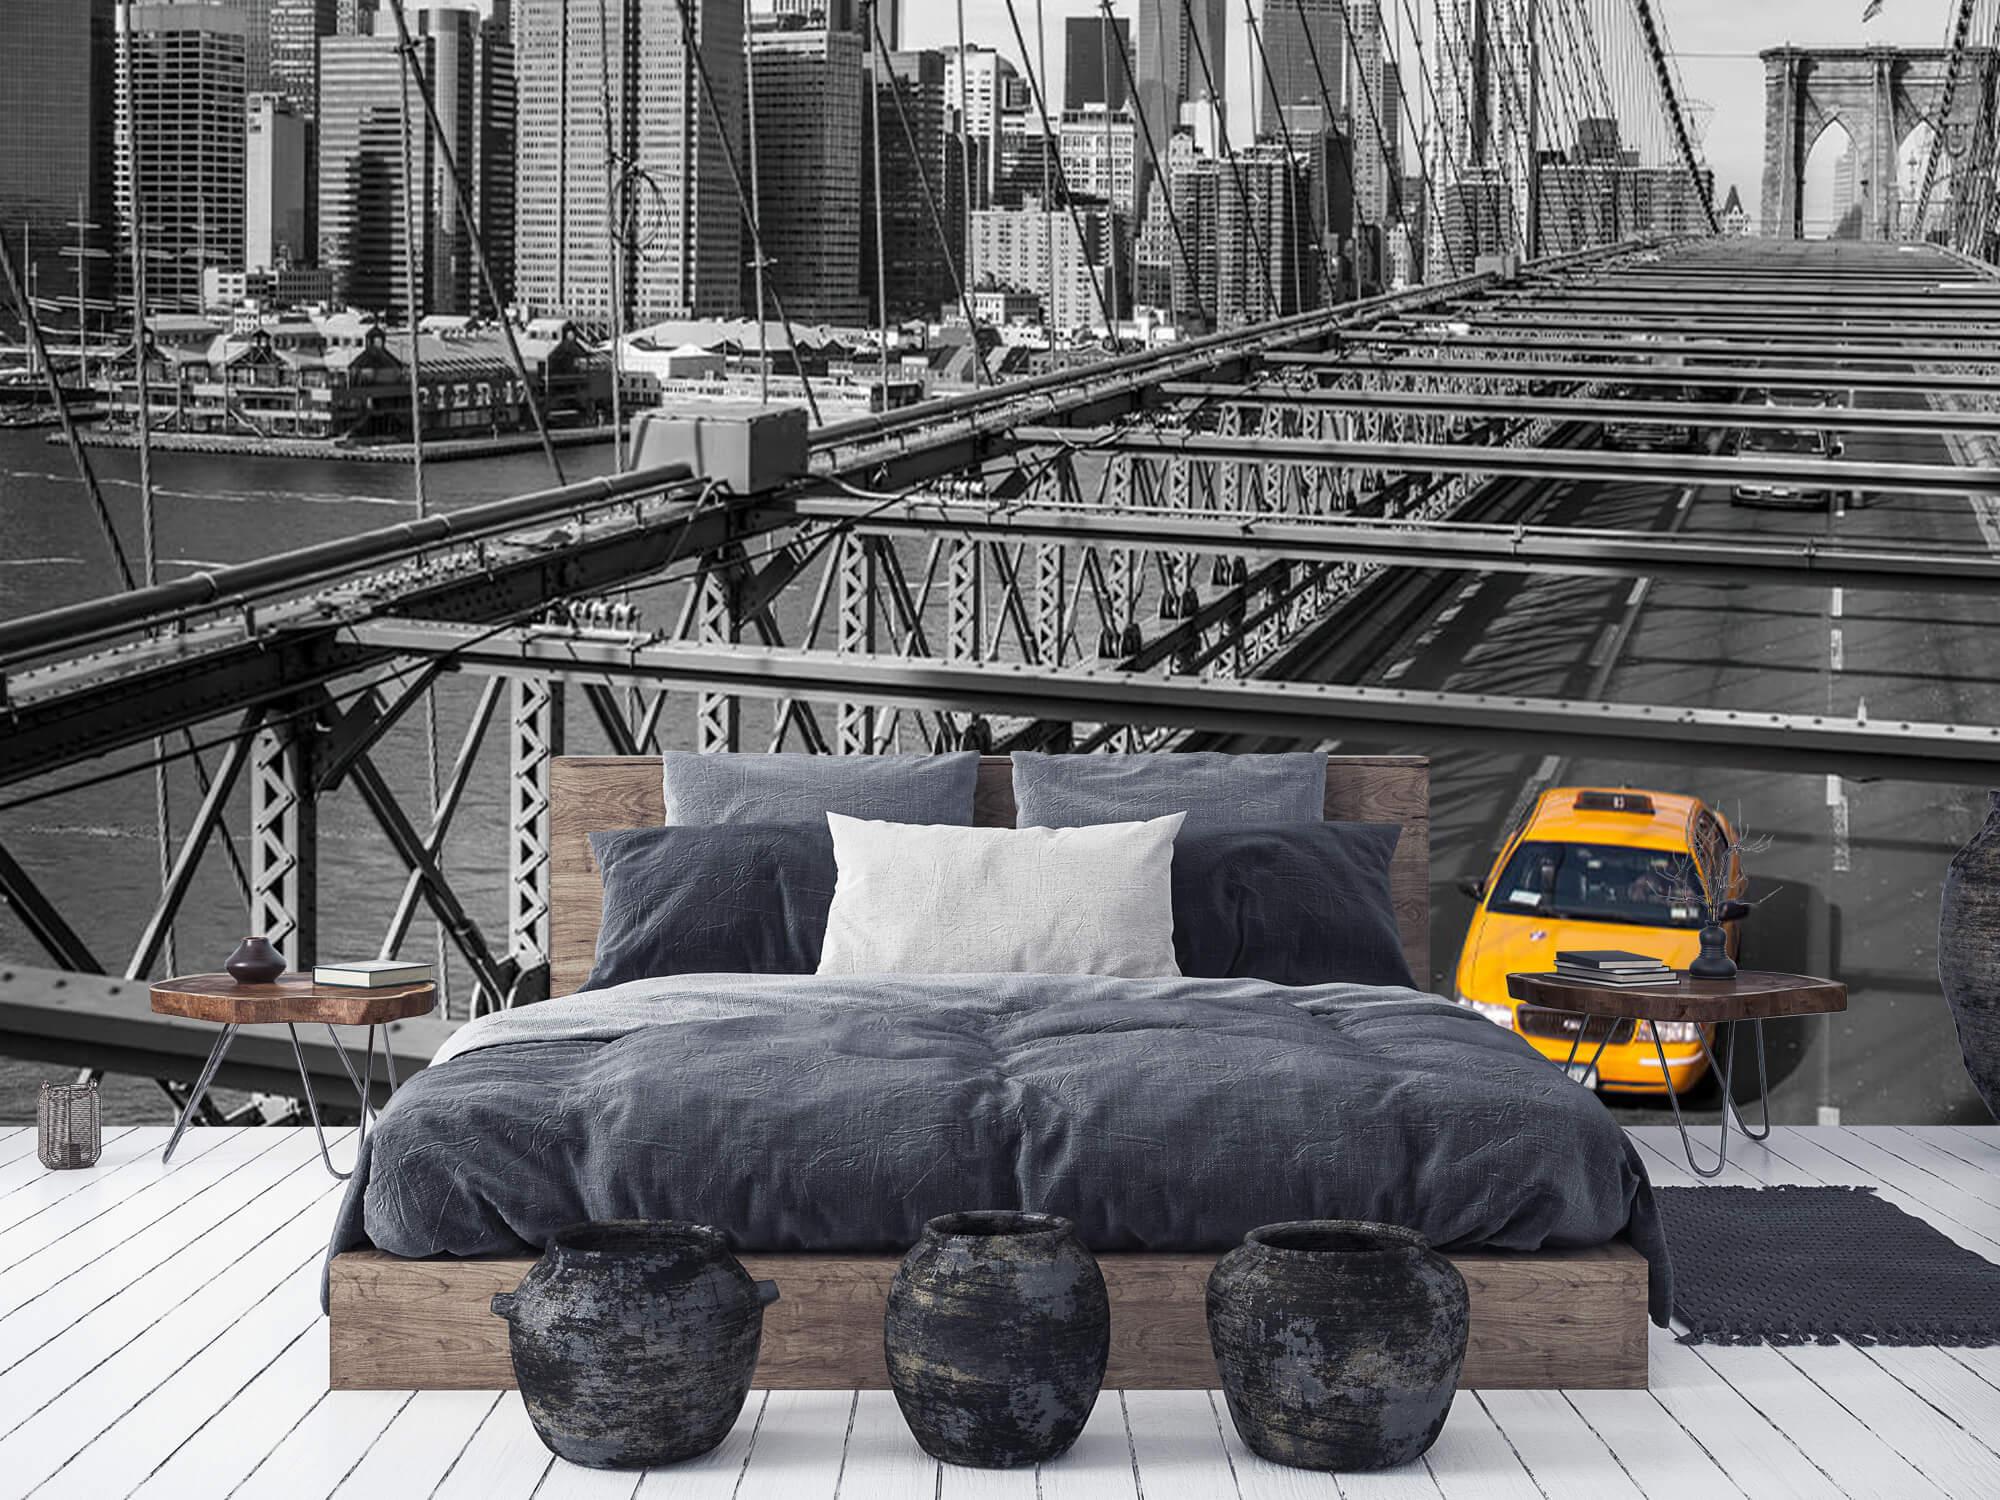 Un taxi sur le pont de Brooklyn 9